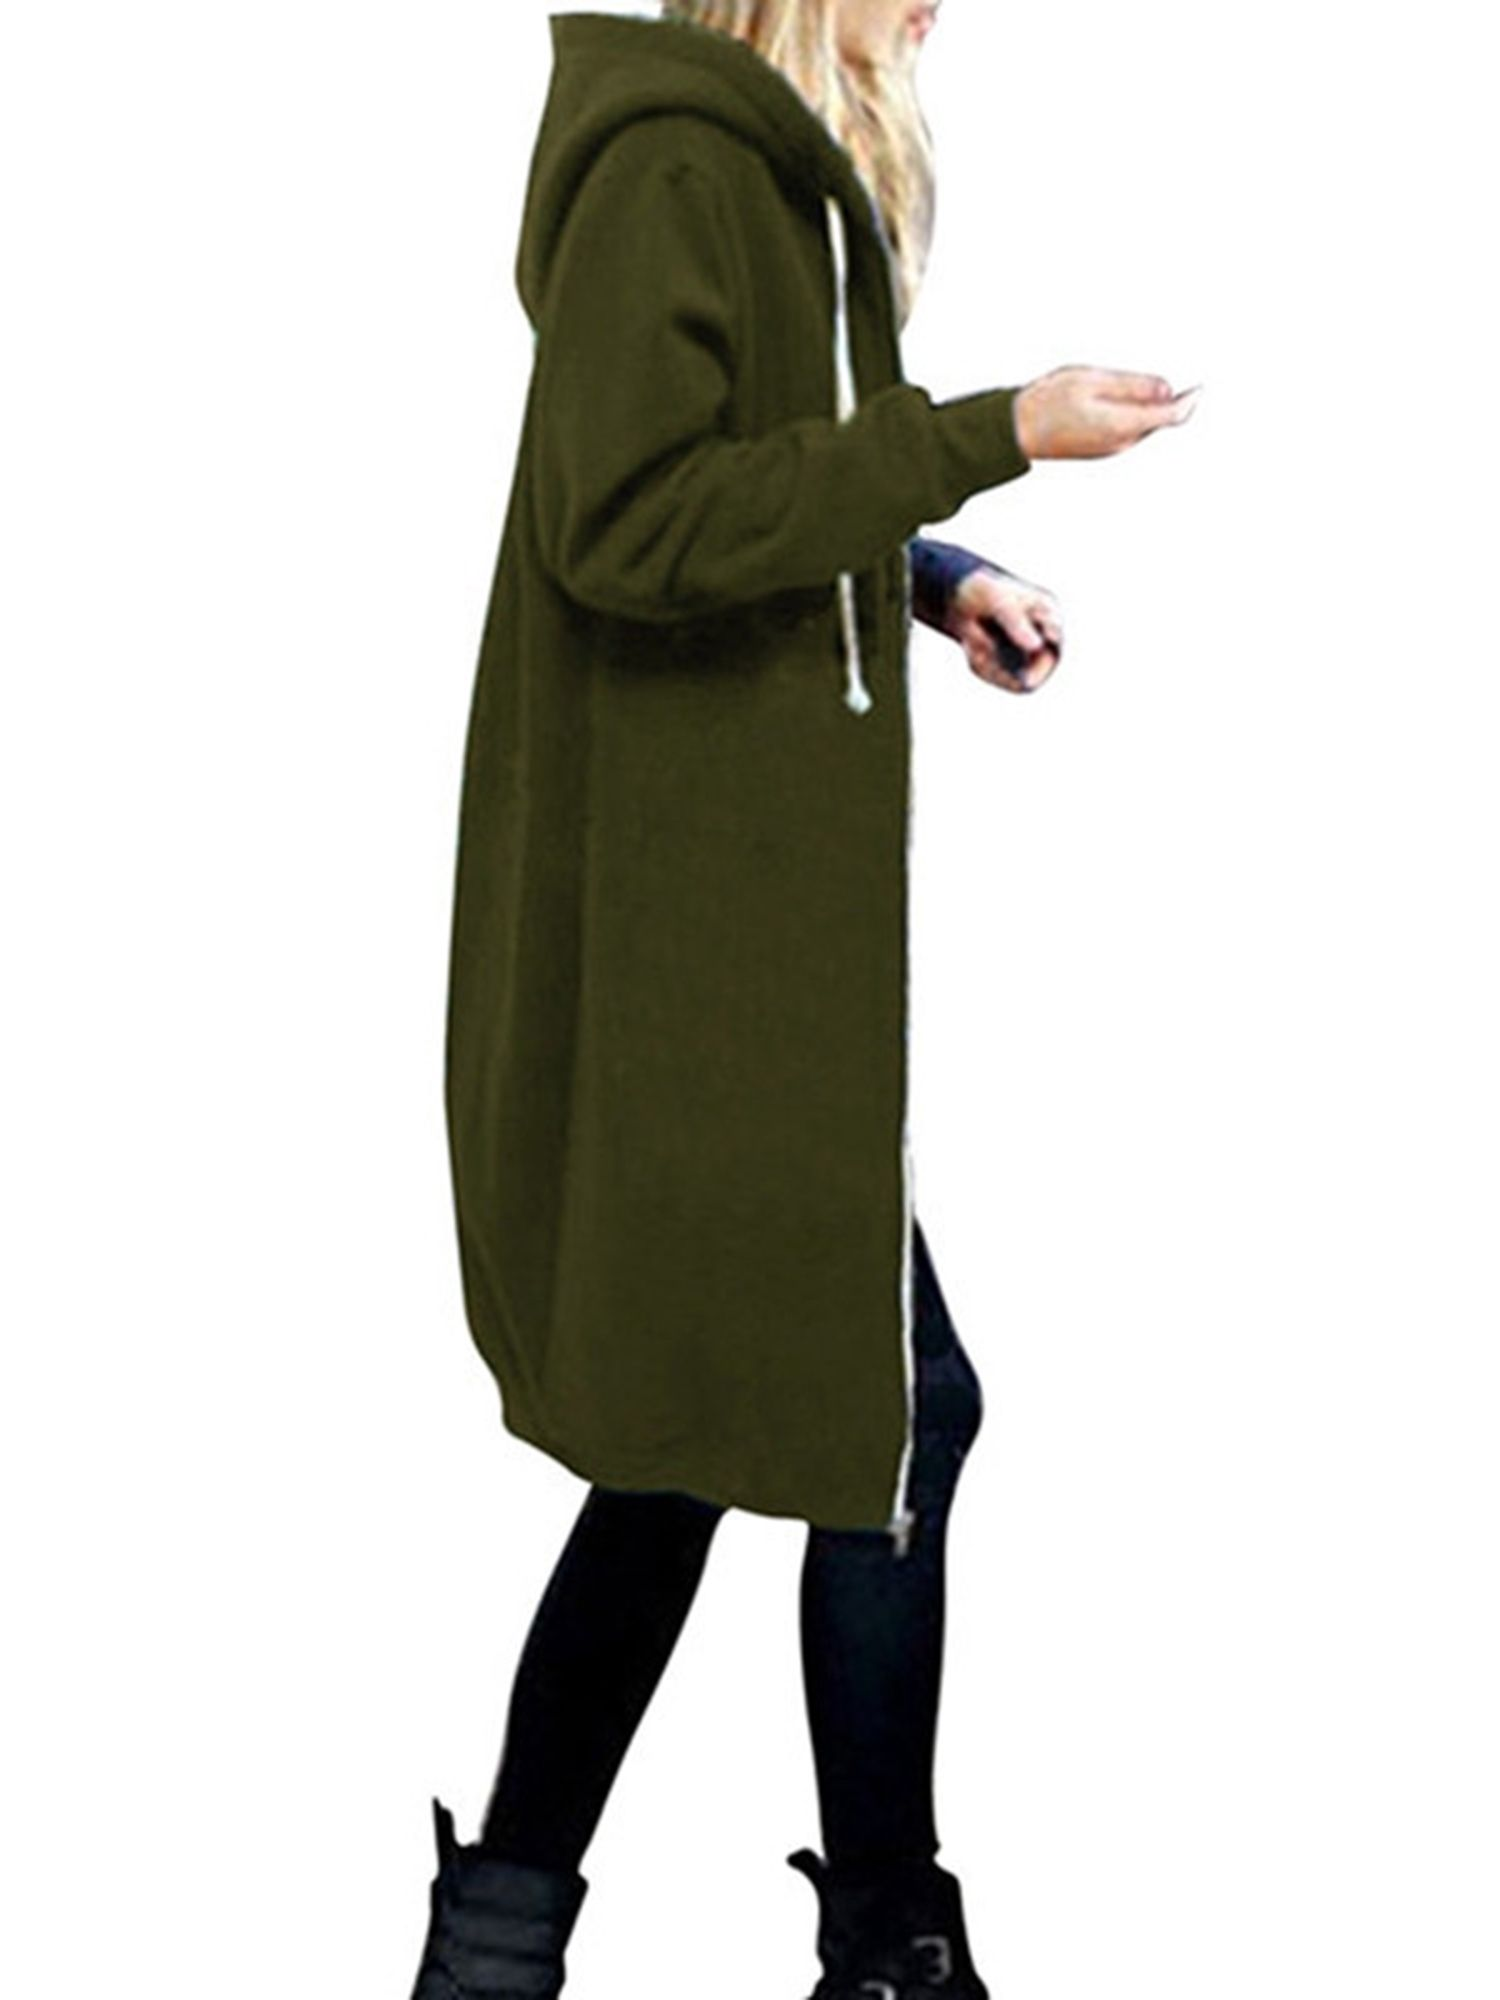 Plus Size S Xxxxxl Women Zip Up Long Hoodie Coat Warm Hooded Jacket Parka Overcoats Winter Zipper Outwear Oversized Tops Casual Solid Hoody Sweatshirts Hoodie Women Hoodies Sweatshirts Long Hoodie [ 2000 x 1500 Pixel ]